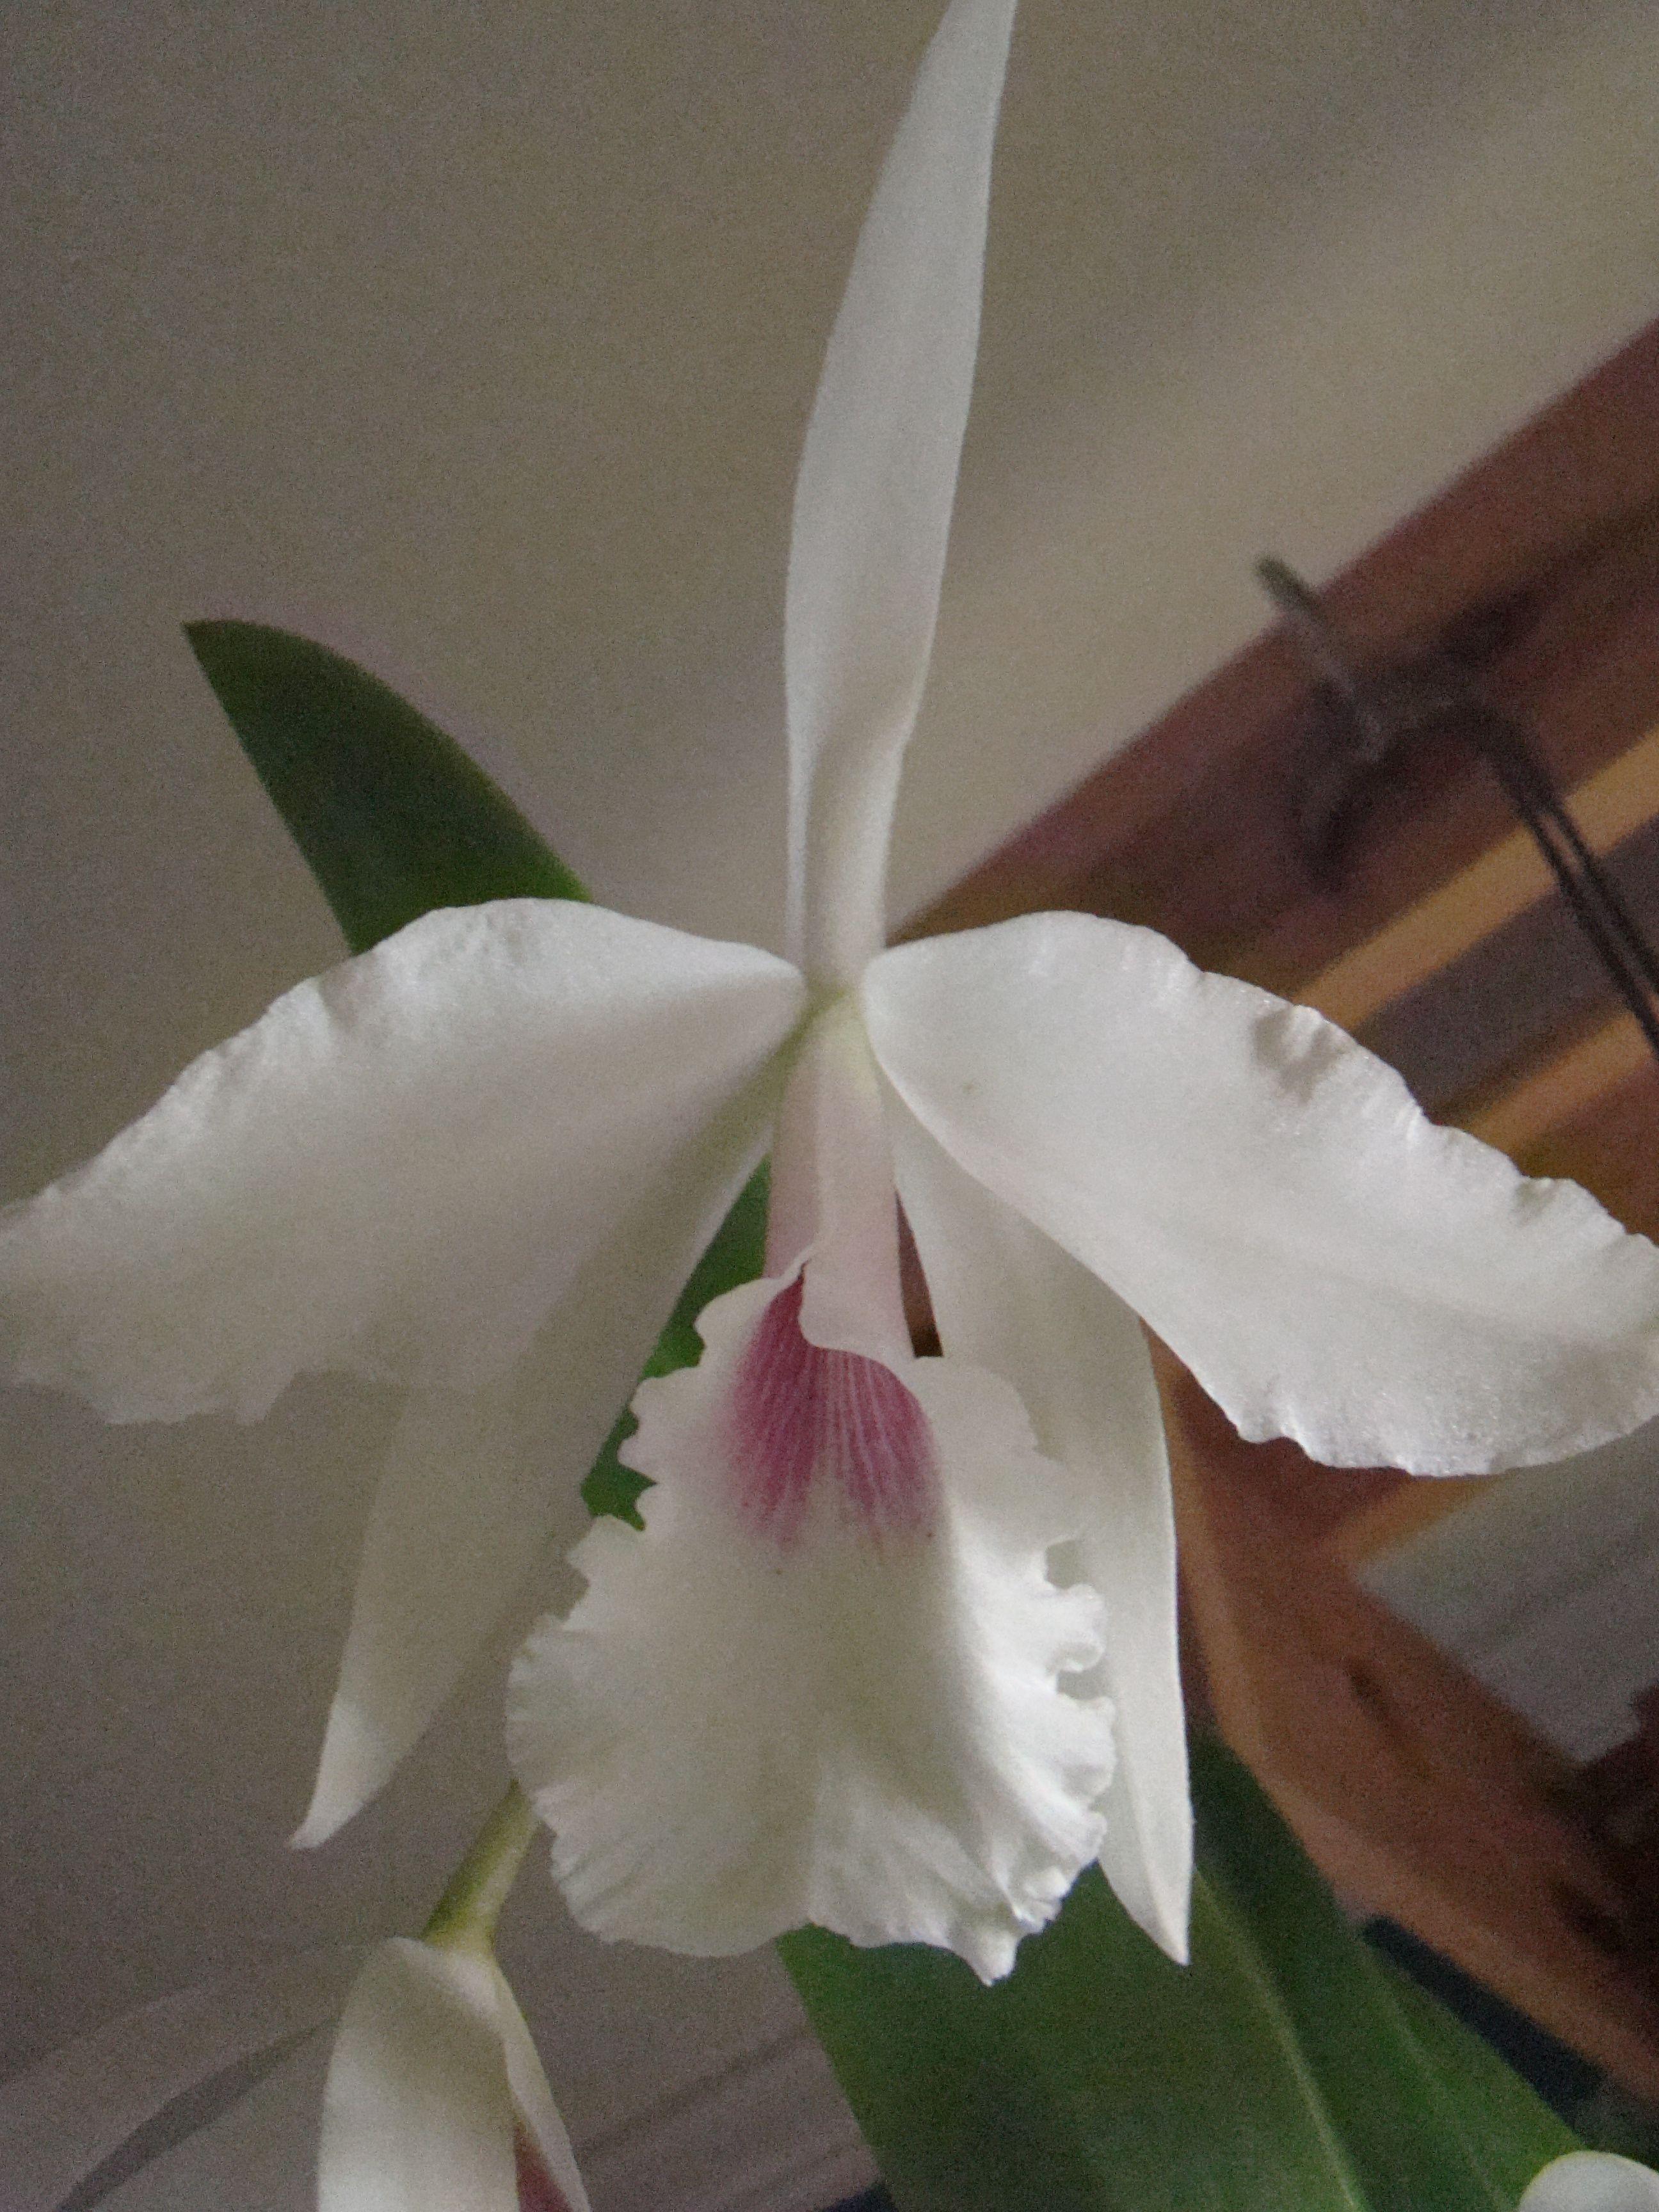 Bc Inboriboon has a lovely fragrance